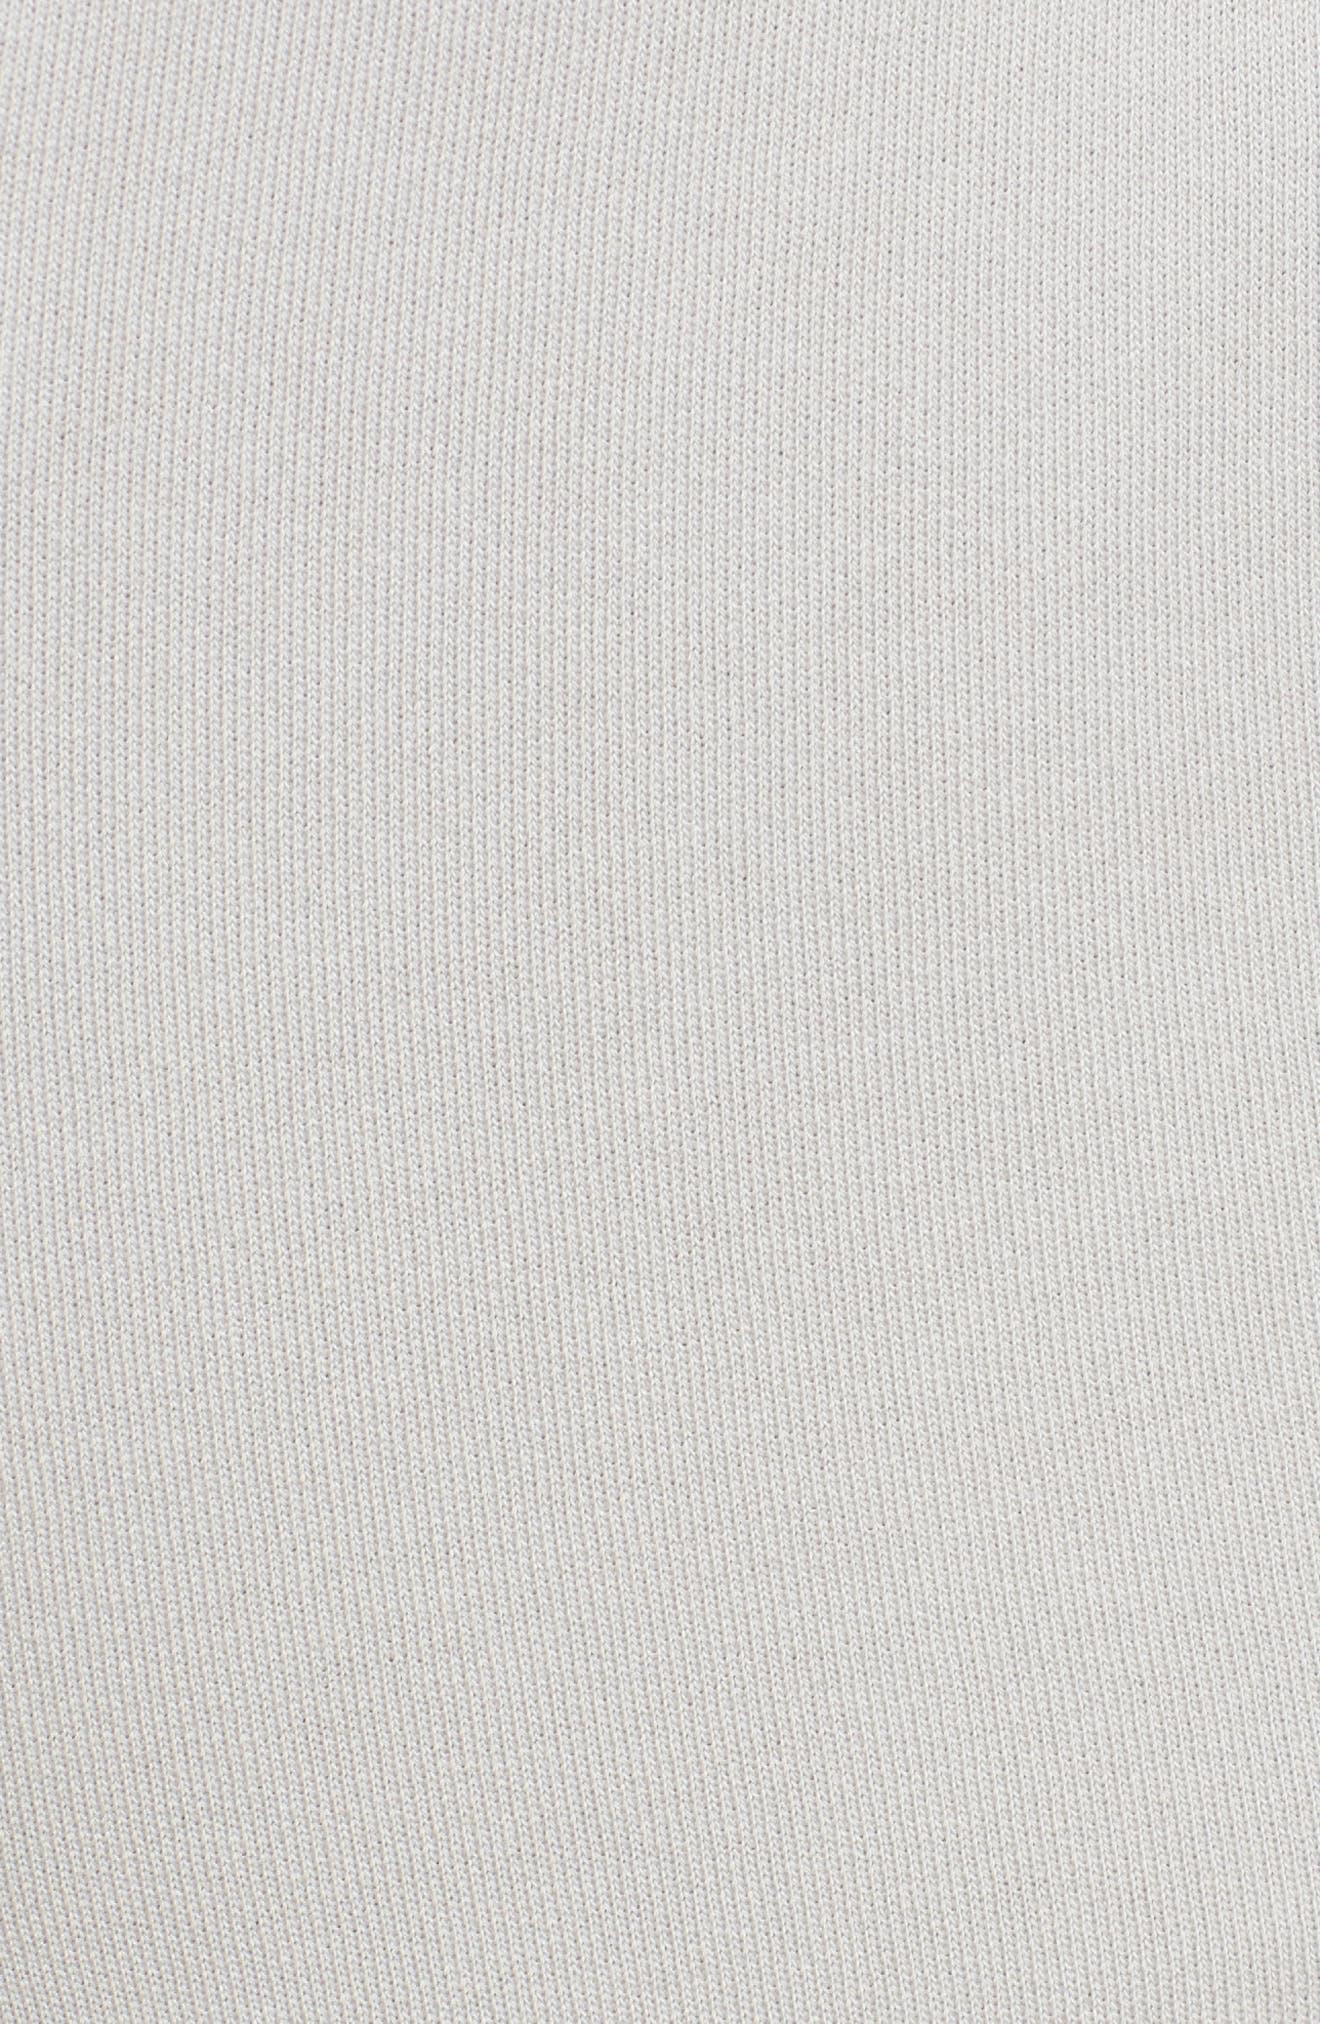 Alternate Image 5  - Frank & Eileen Tee Lab Fleece Knit Gauchos